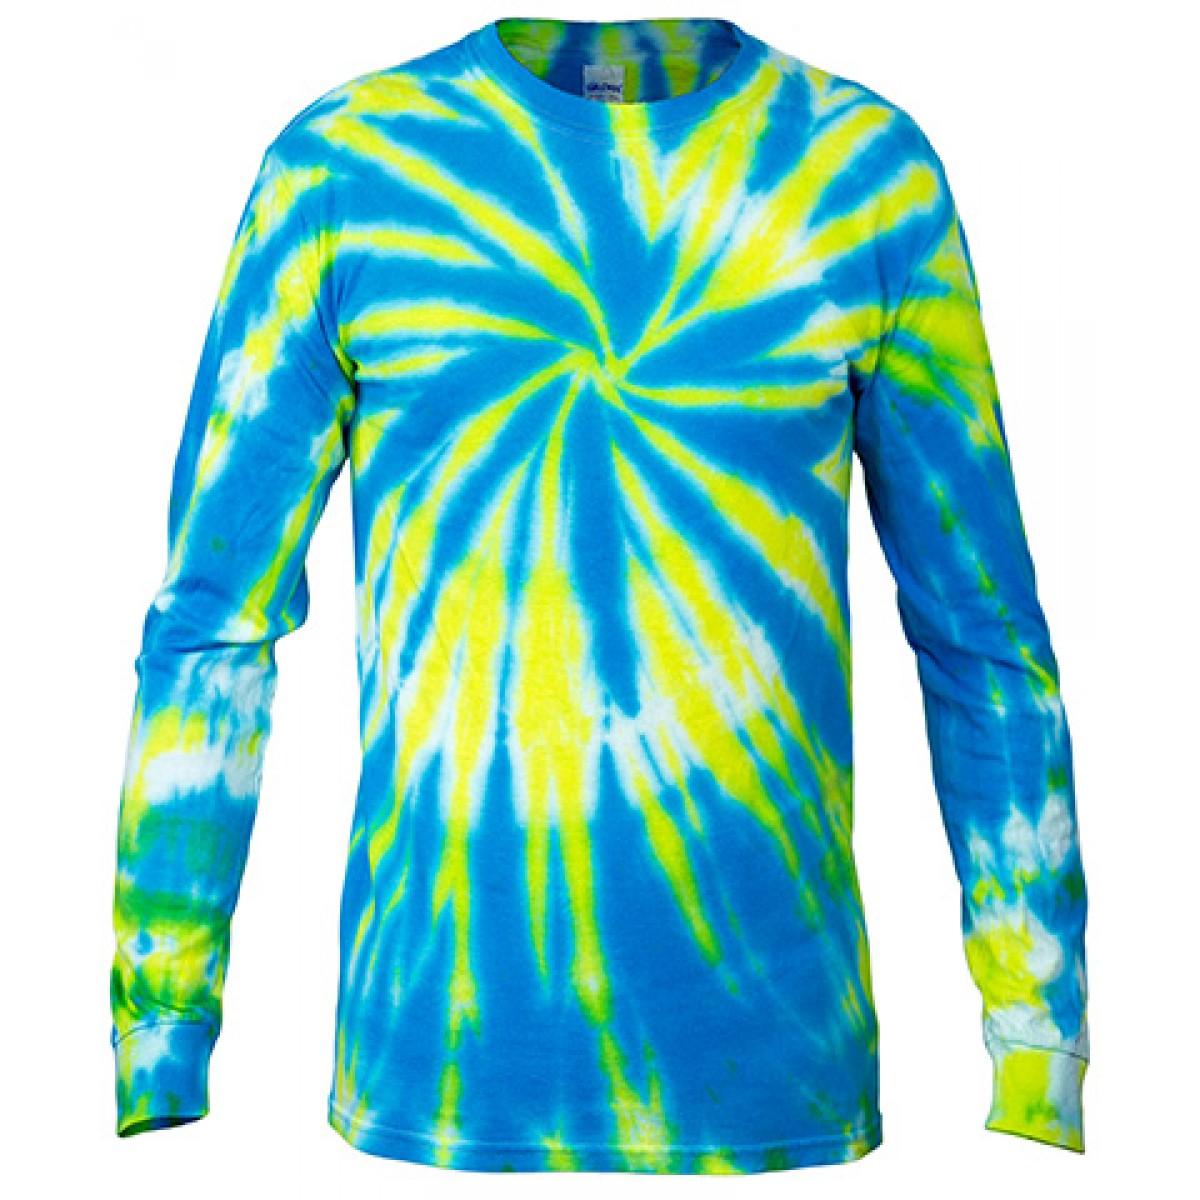 Multi Color Tie-Dye Long Sleeve Shirt -Blue-XL